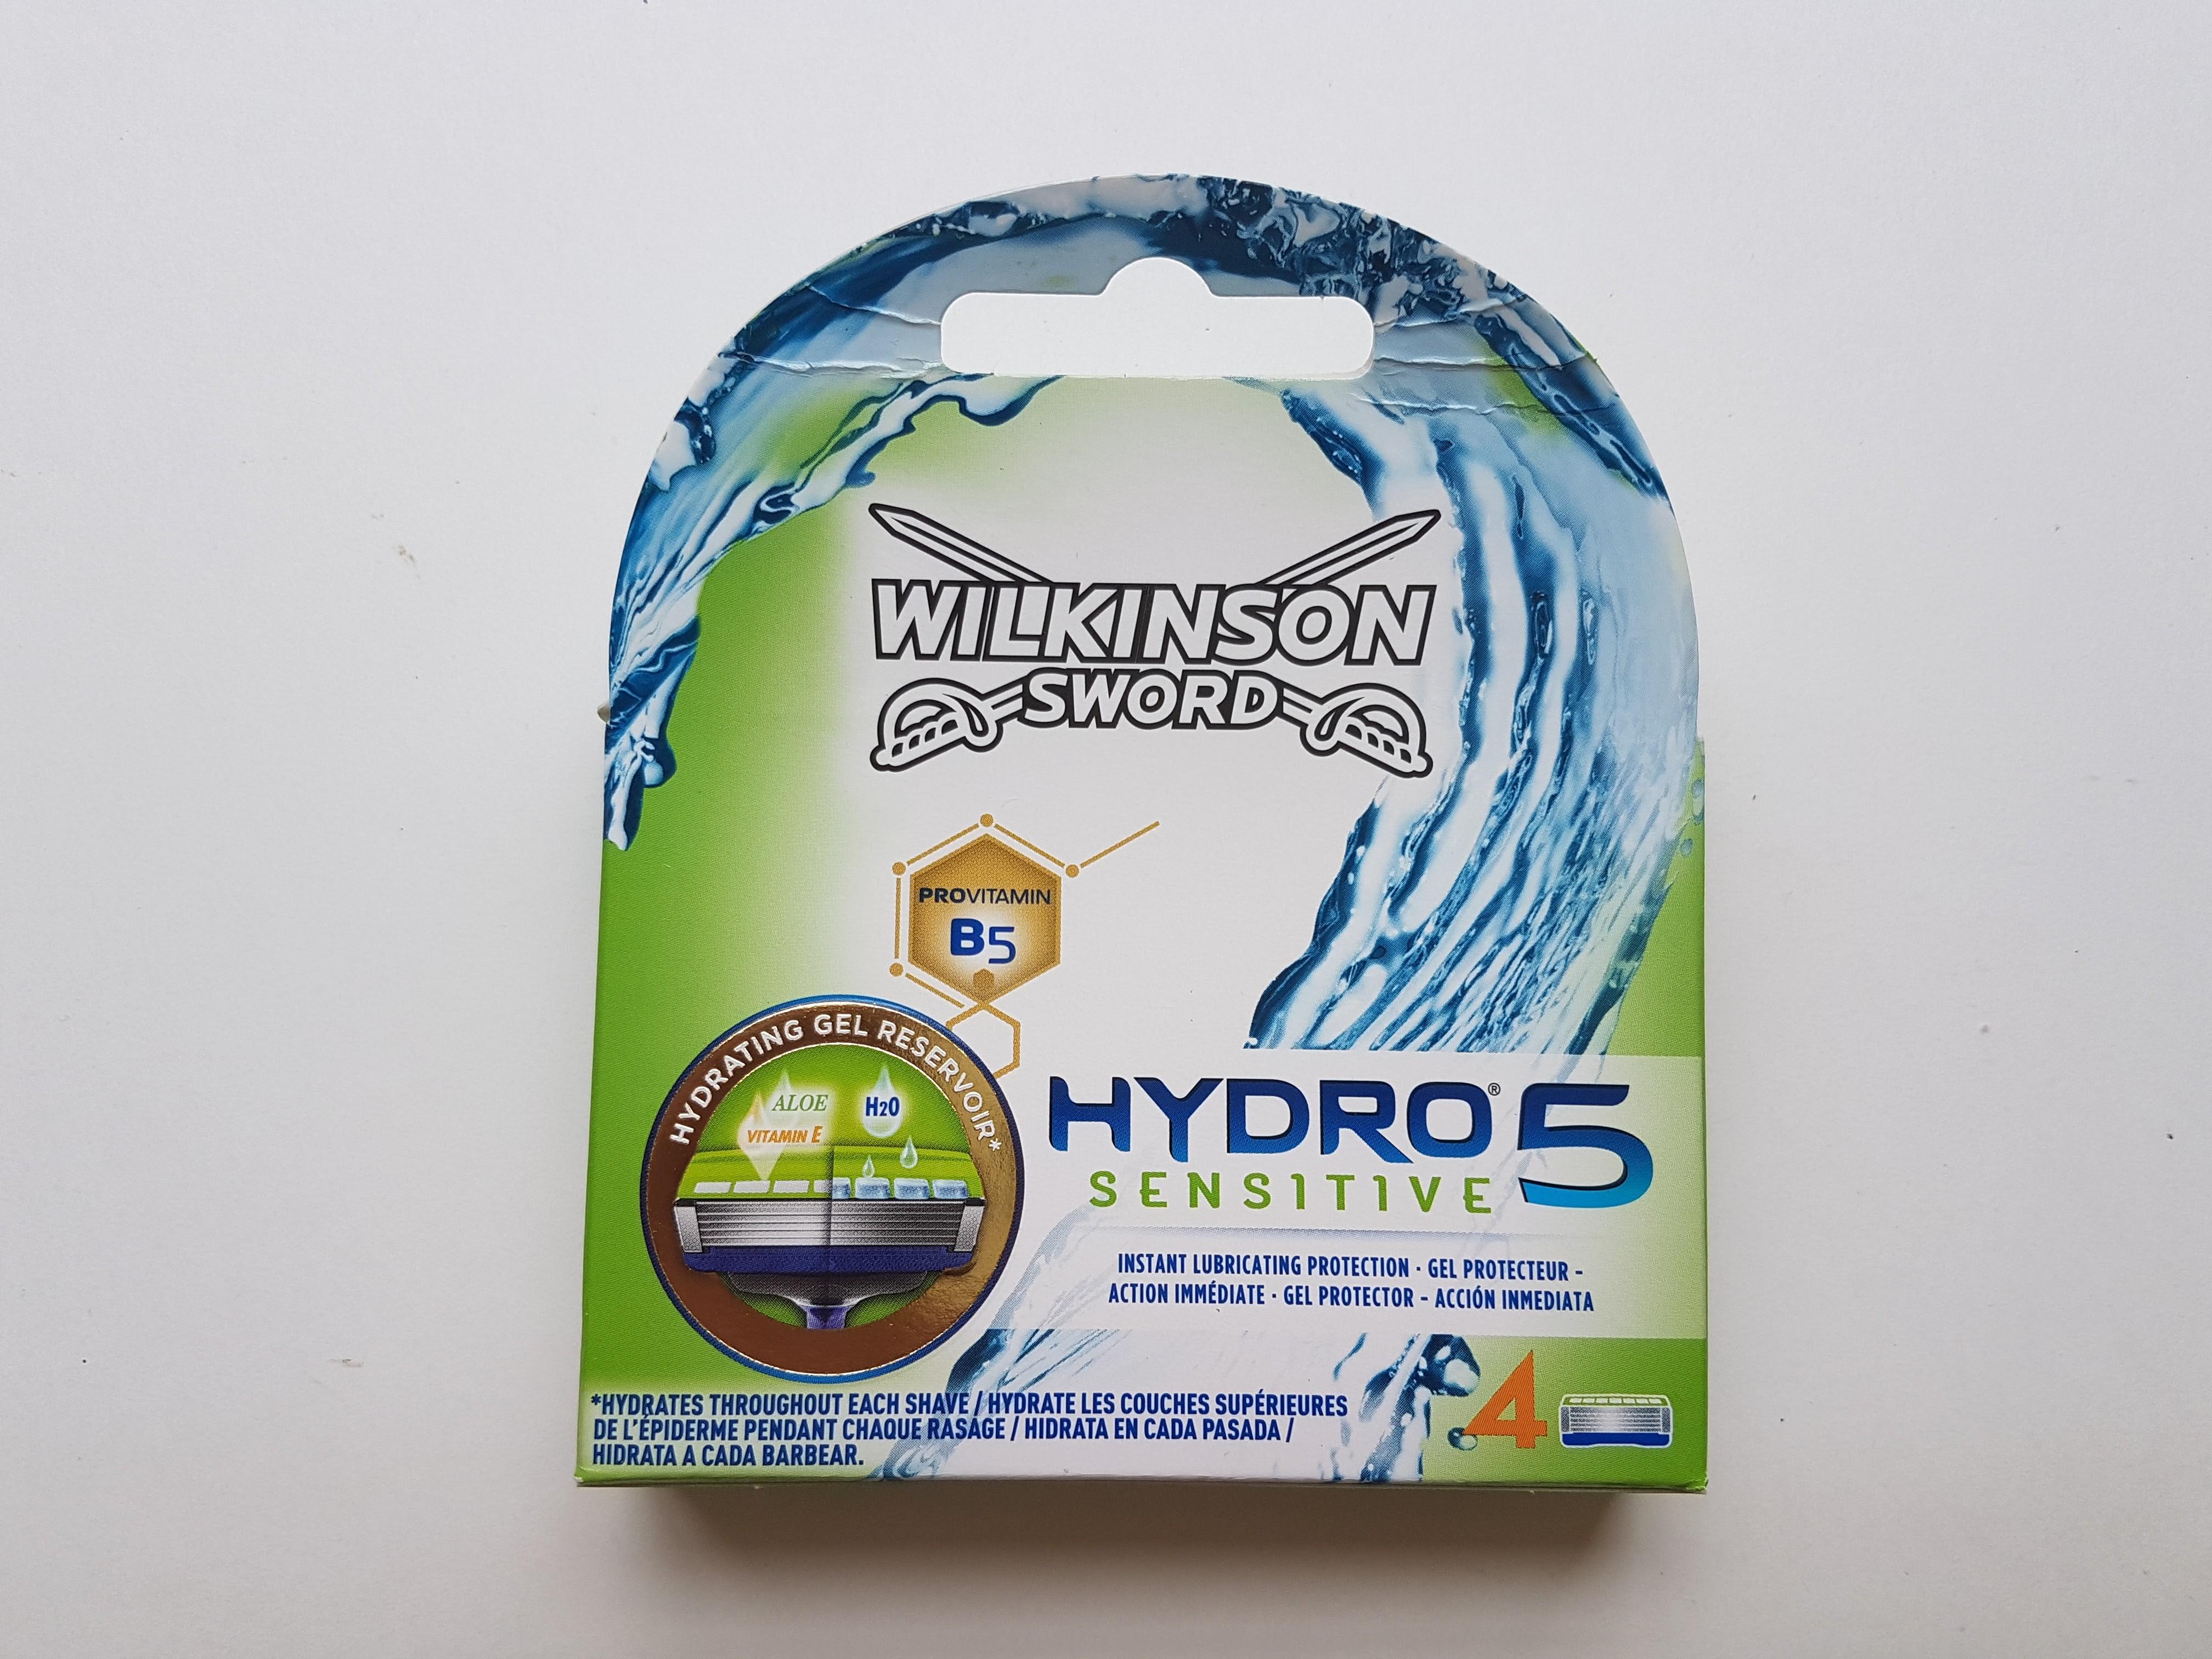 Wilkinson-Sword-Hydro-5 - Wilkinson-Sword-Hydro-5-7.jpg